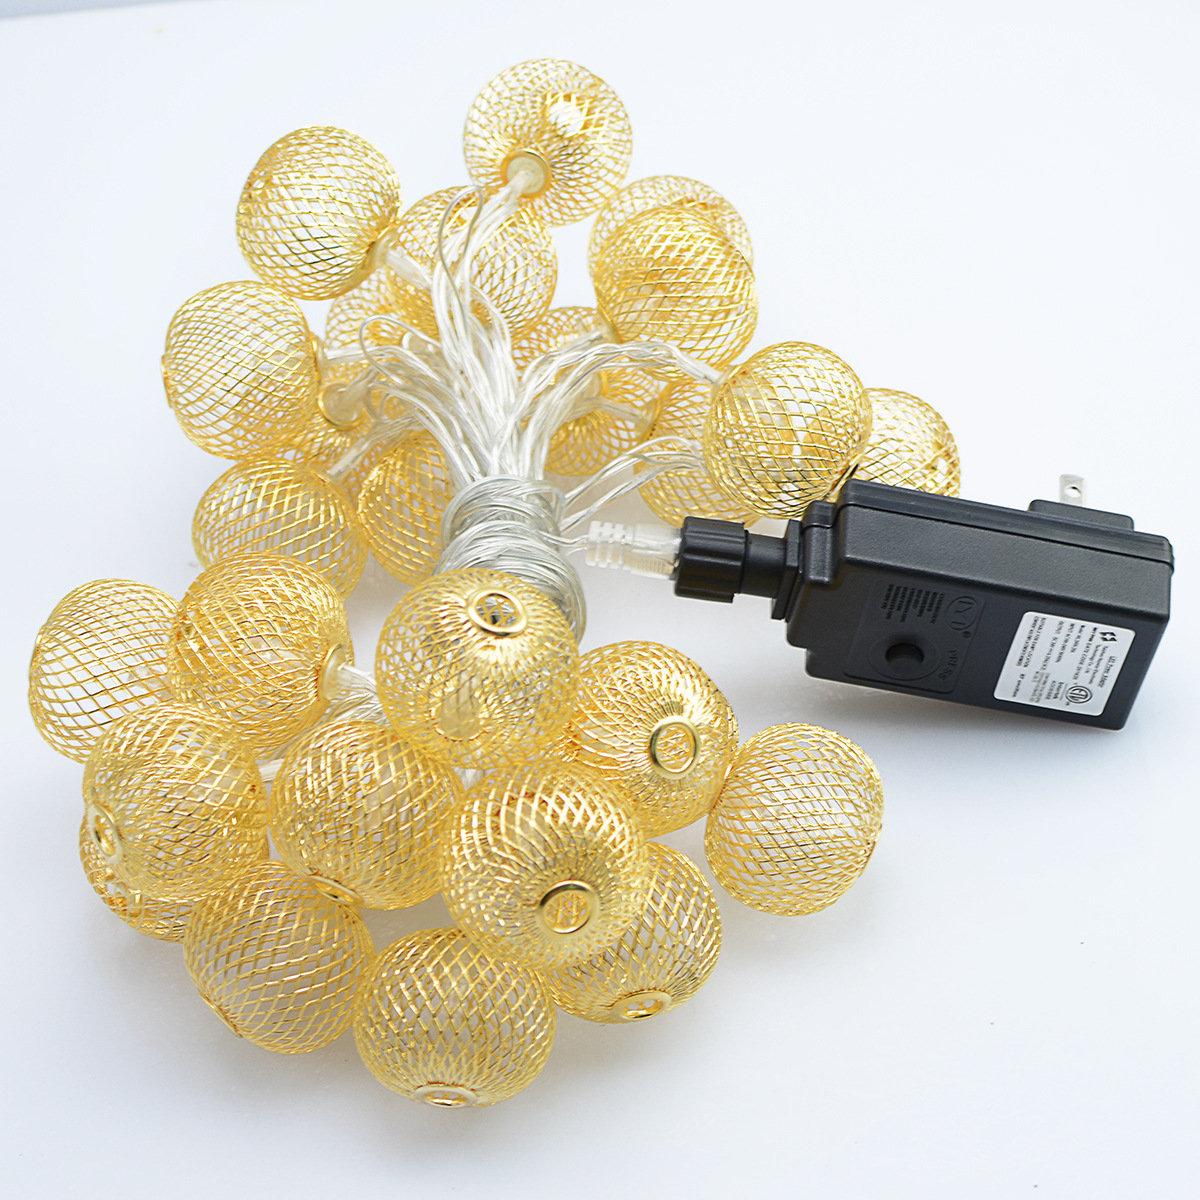 KCASA SSL-6 Gardening 4.8M 20LED Solar Panel Light Lantern Holiday Christmas Wedding Decoration